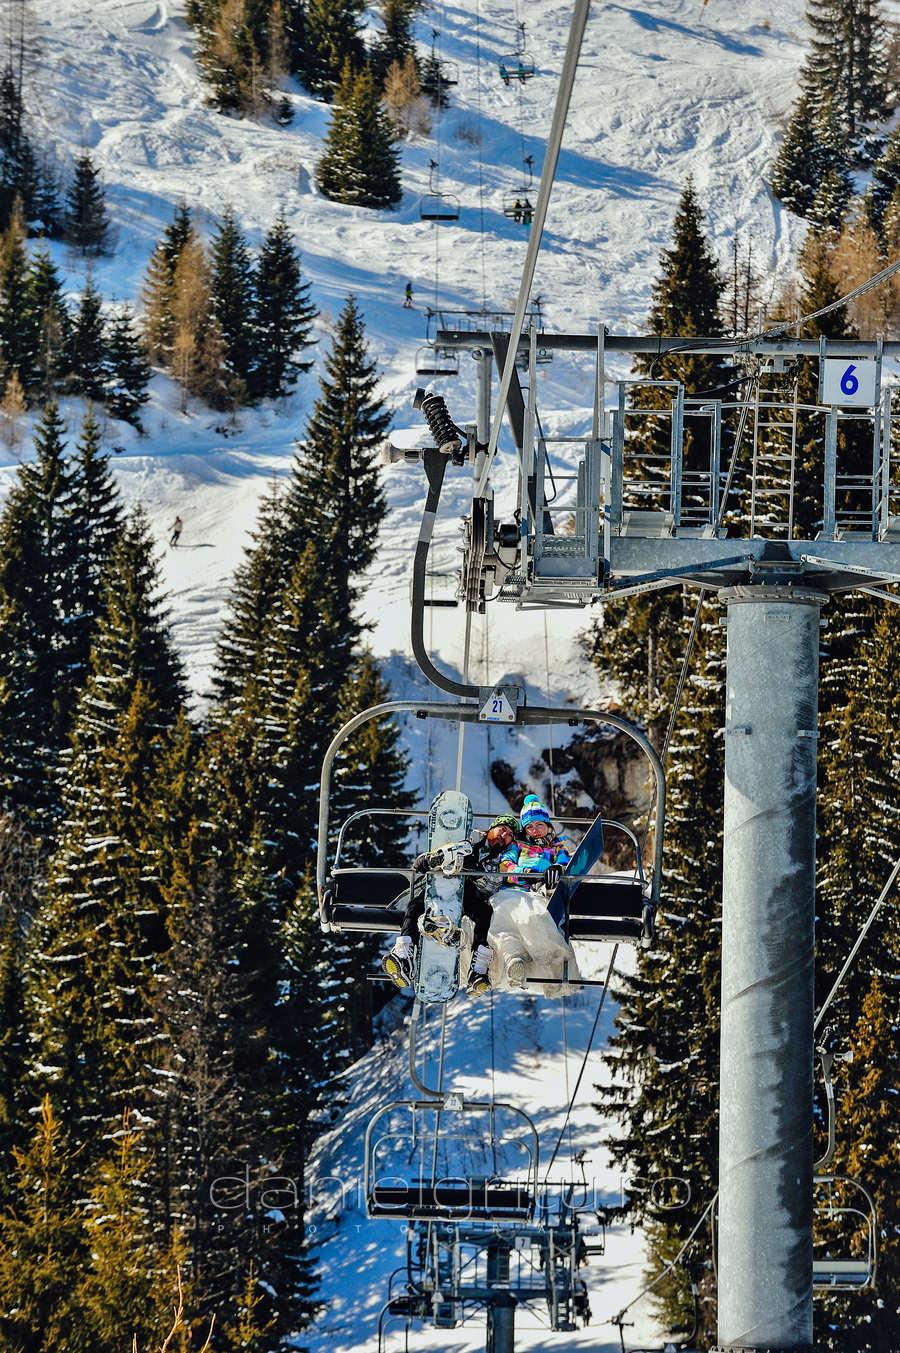 Fotograf nunta | Sedinta foto iarna pe zapada | Snowboard